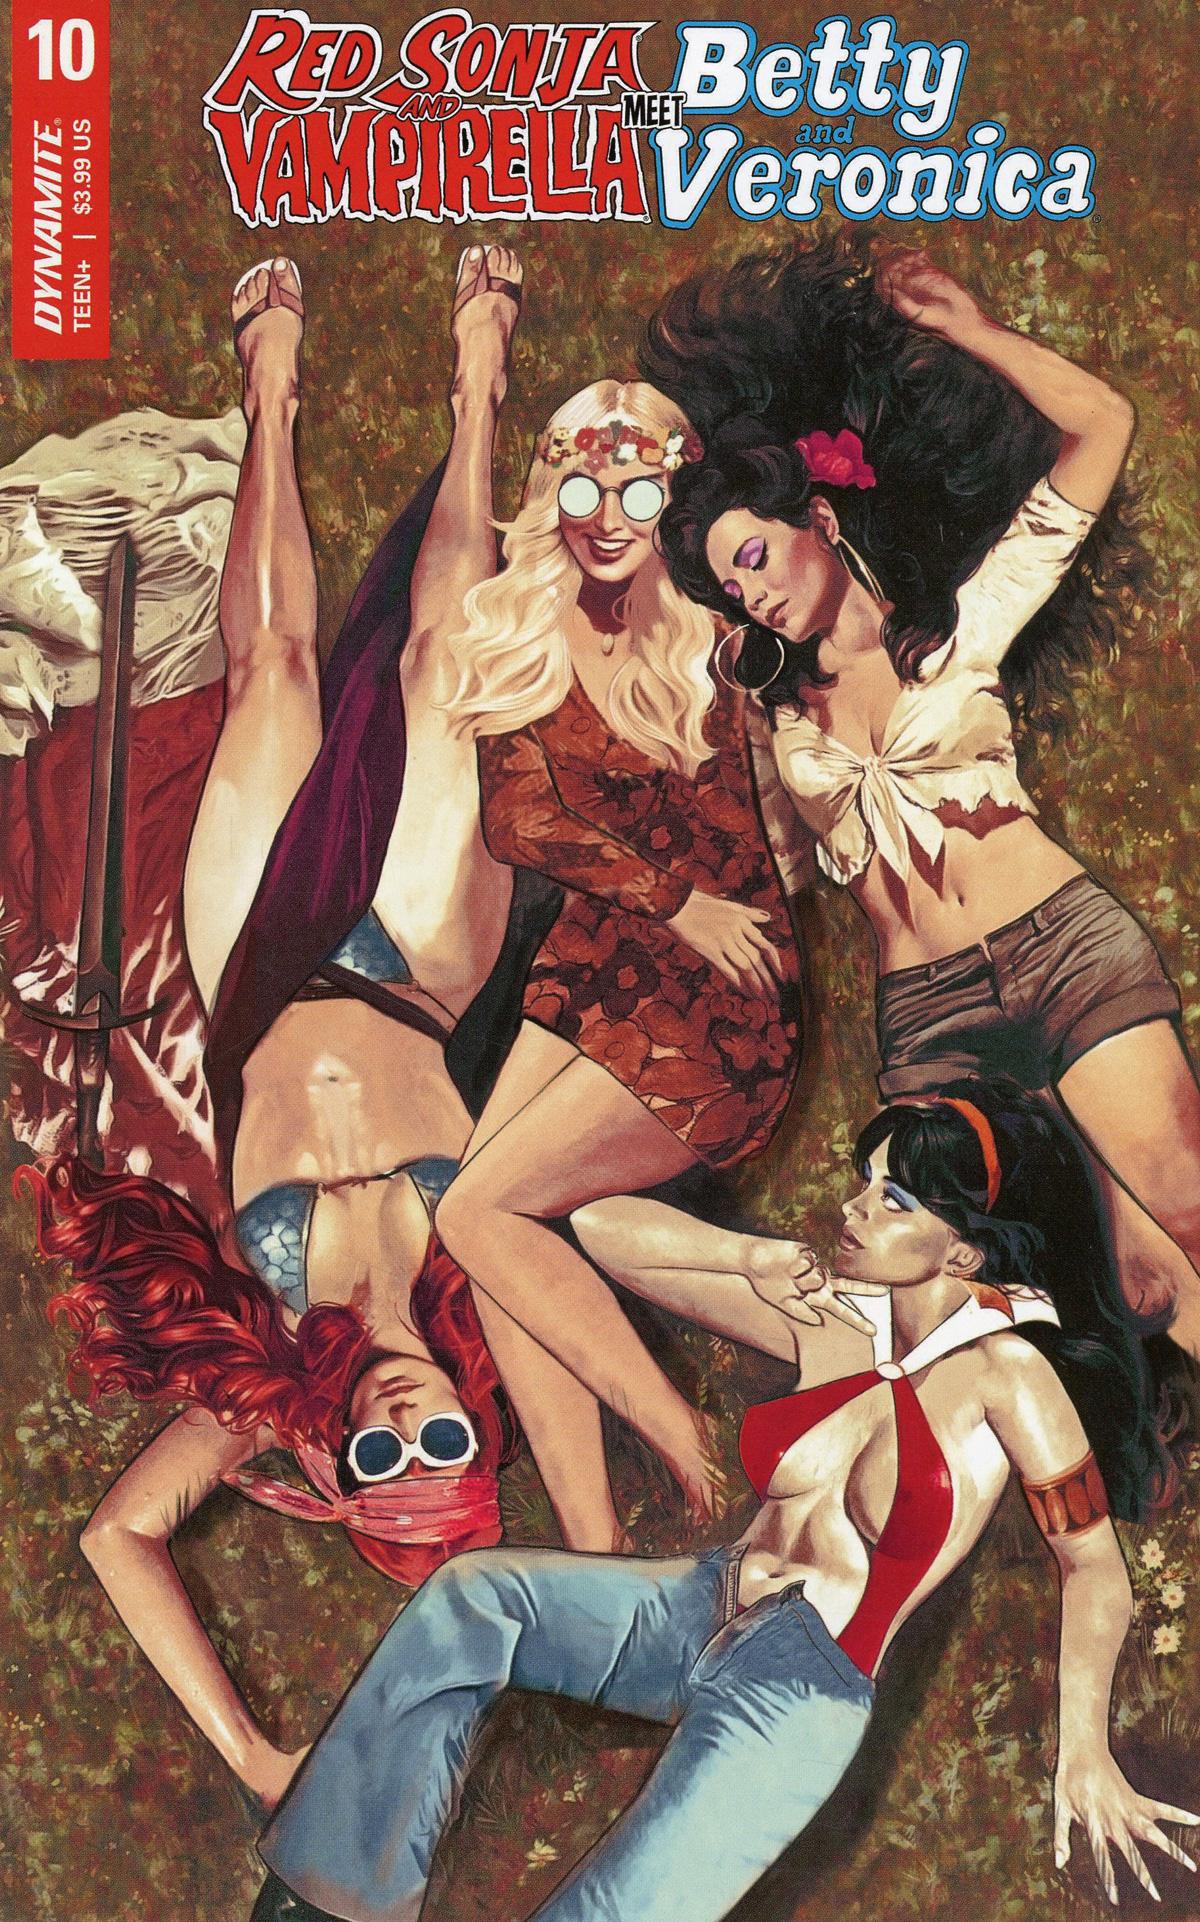 Red Sonja And Vampirella Meet Betty And Veronica #10 Cover A Regular Fay Dalton Cover